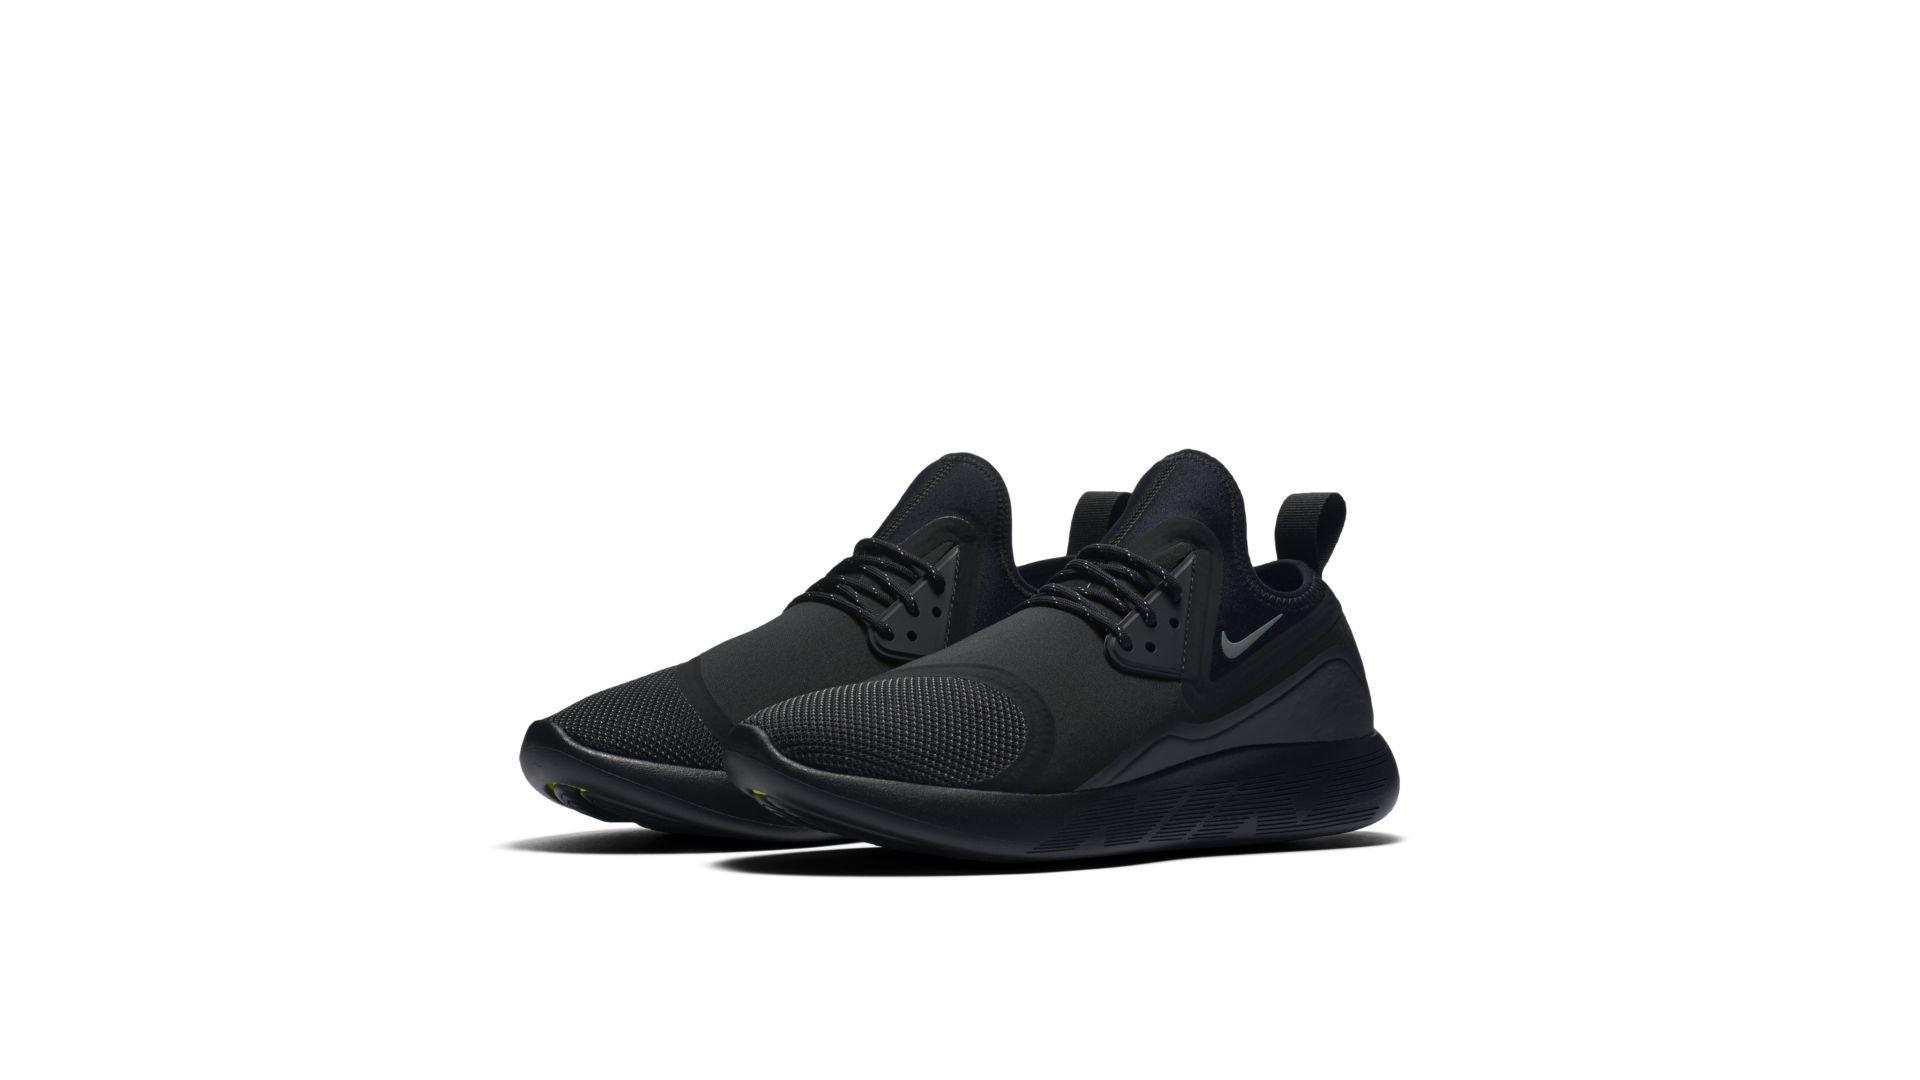 Nike LunarCharge Black (923619 001)